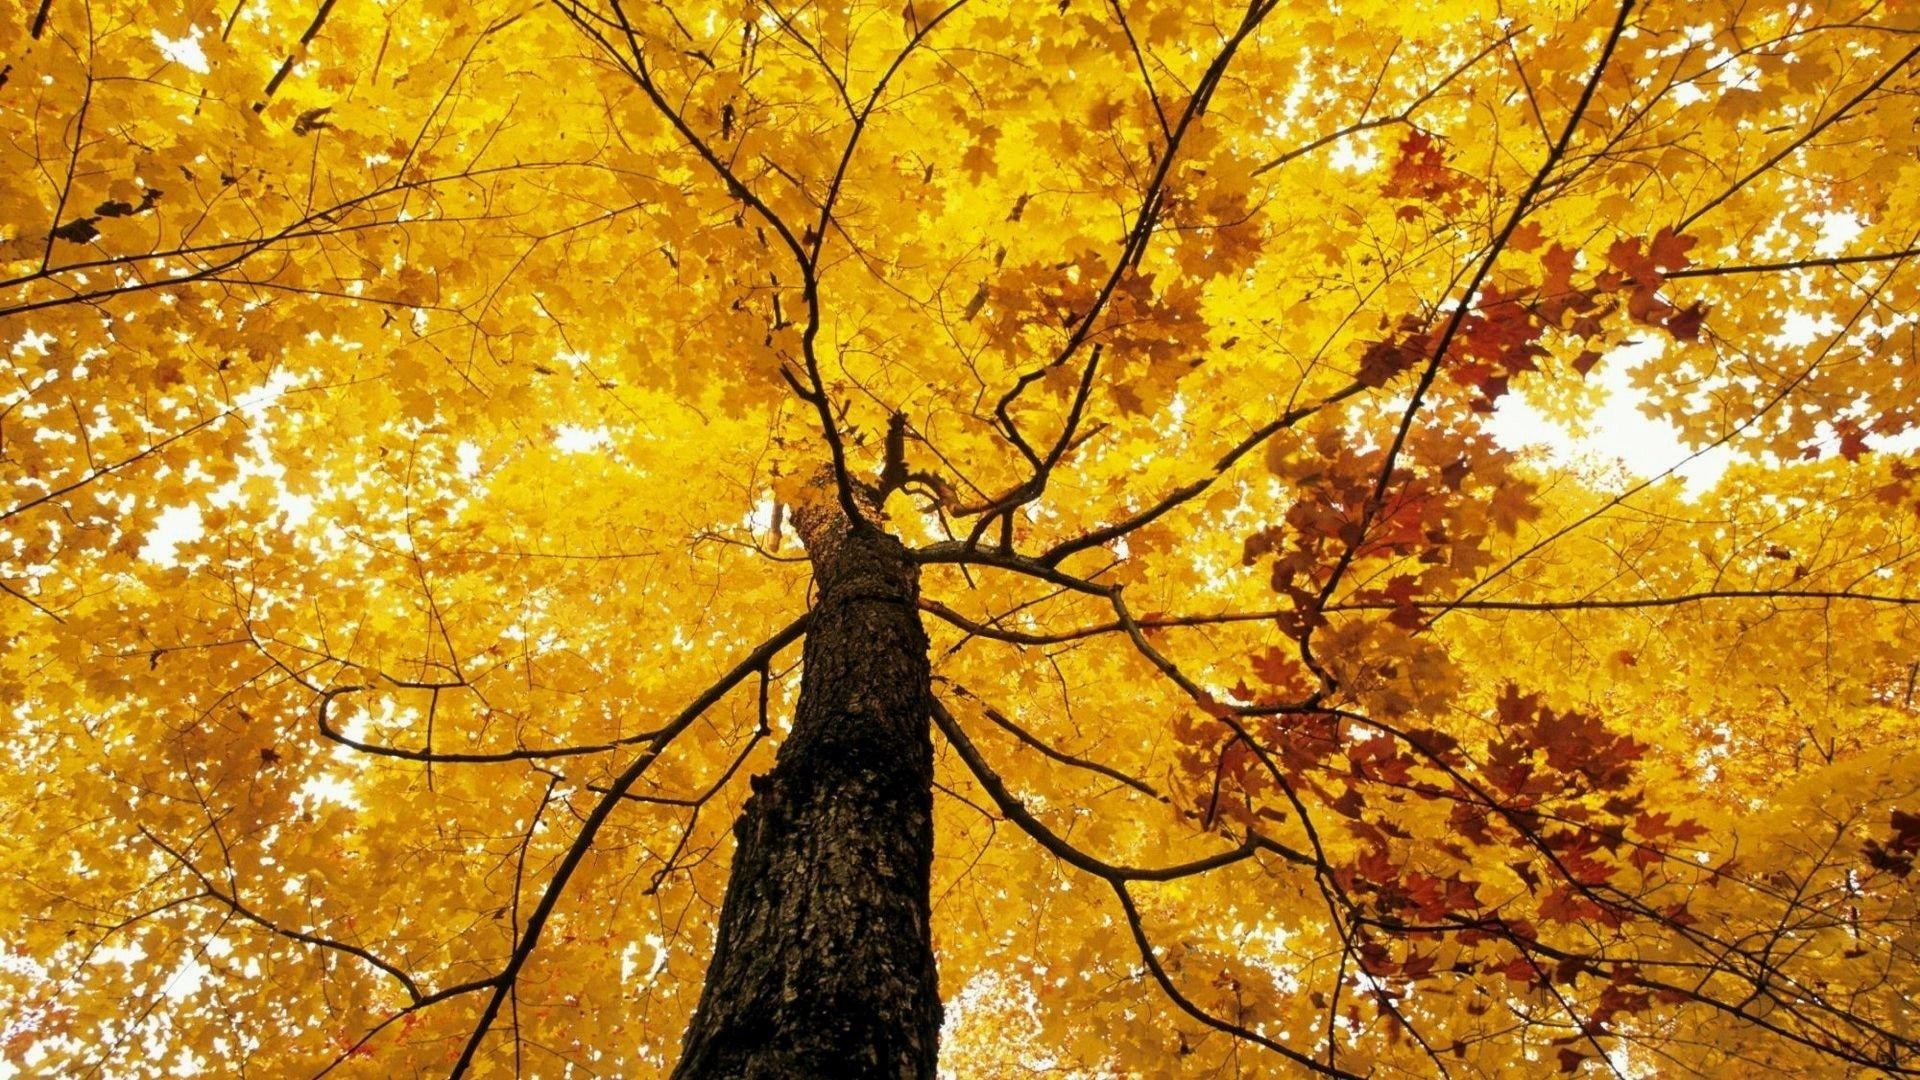 New England Fall Foliage Desktop Wallpaper Fall Foliage Wallpaper For Desktop 183 ① Wallpapertag